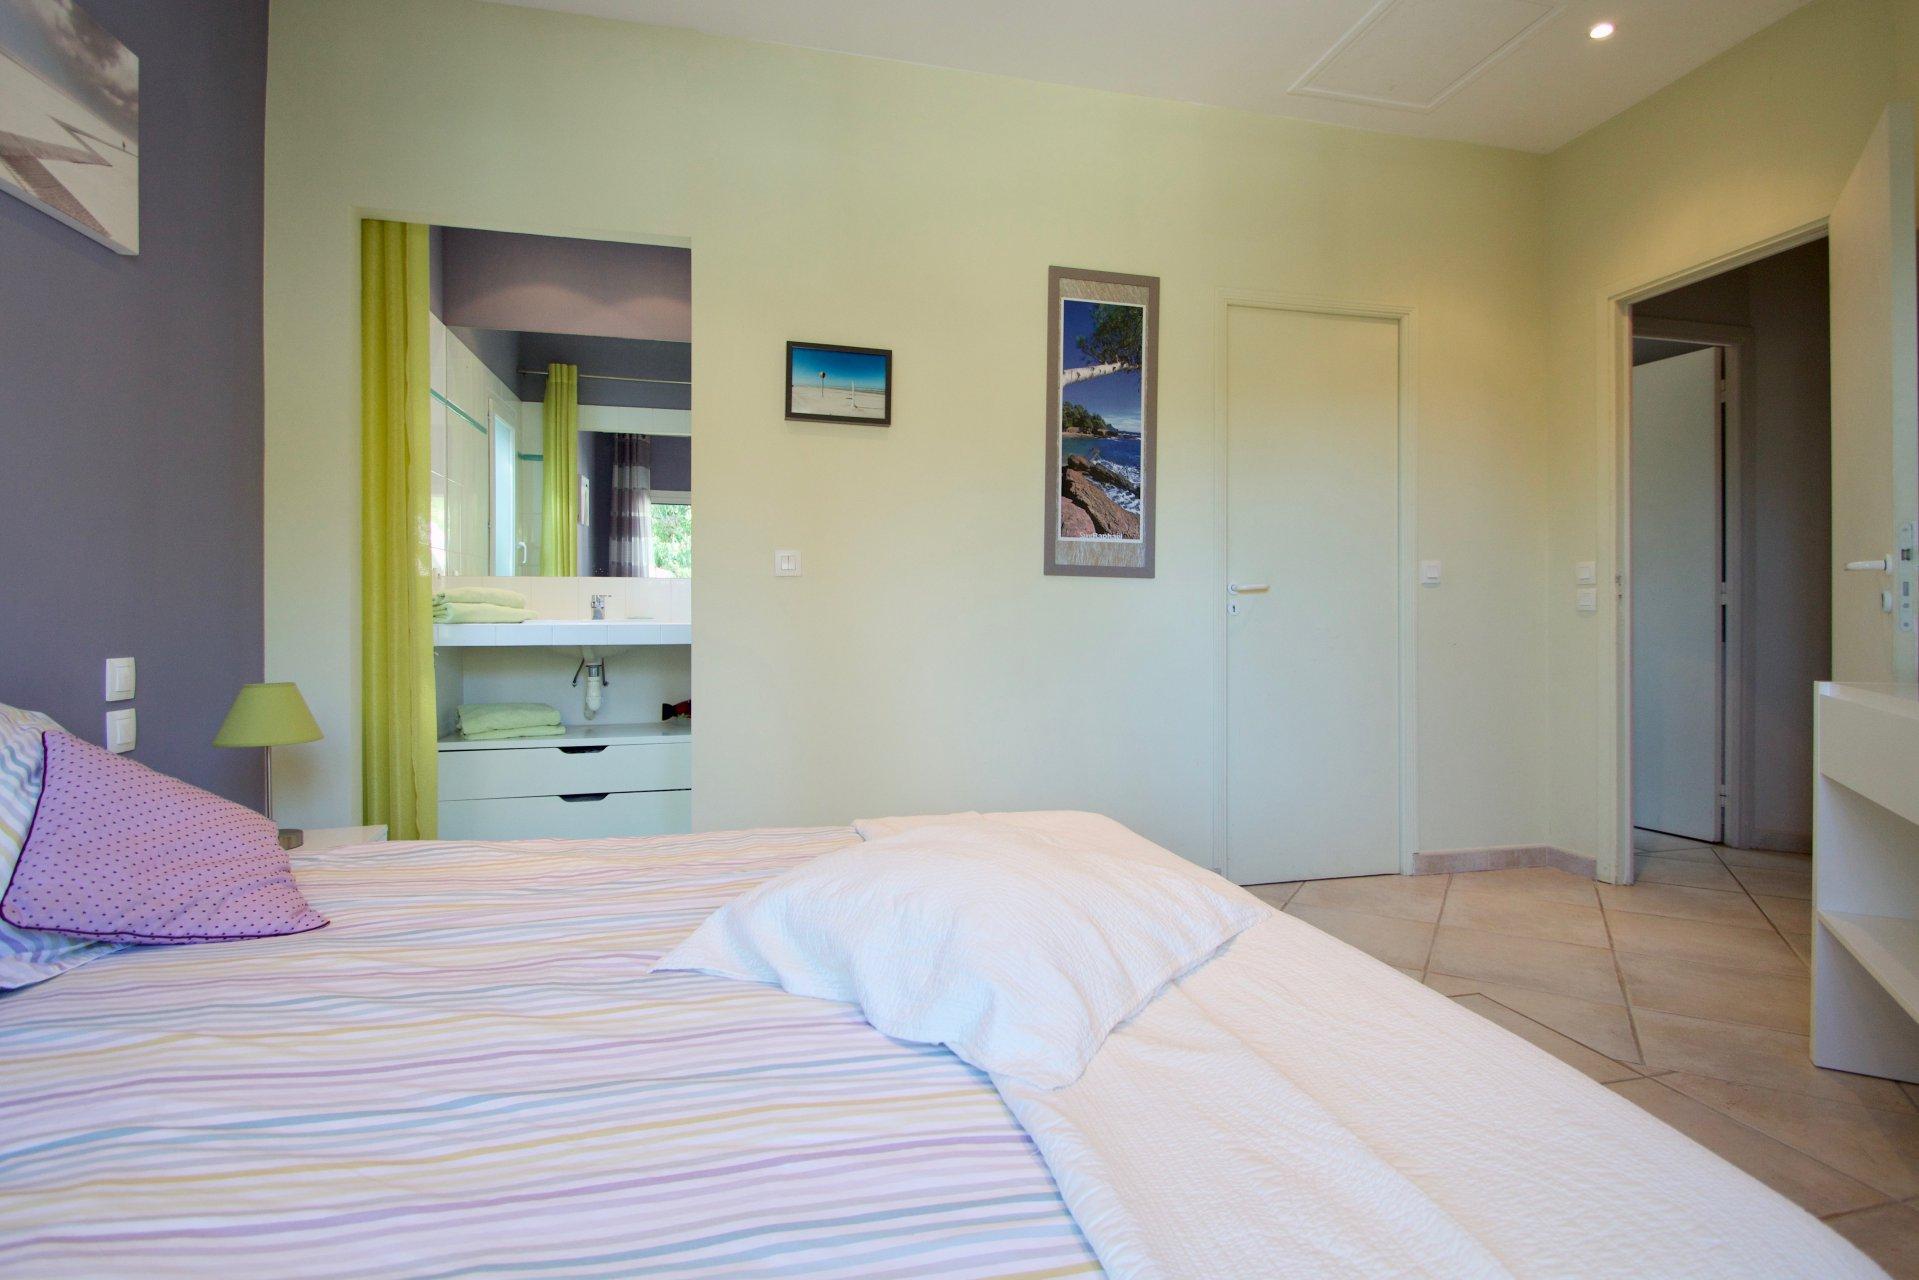 Saint Raphaël - Villa moderne avec 5 chambres, appartement individuelle & 4 SdB